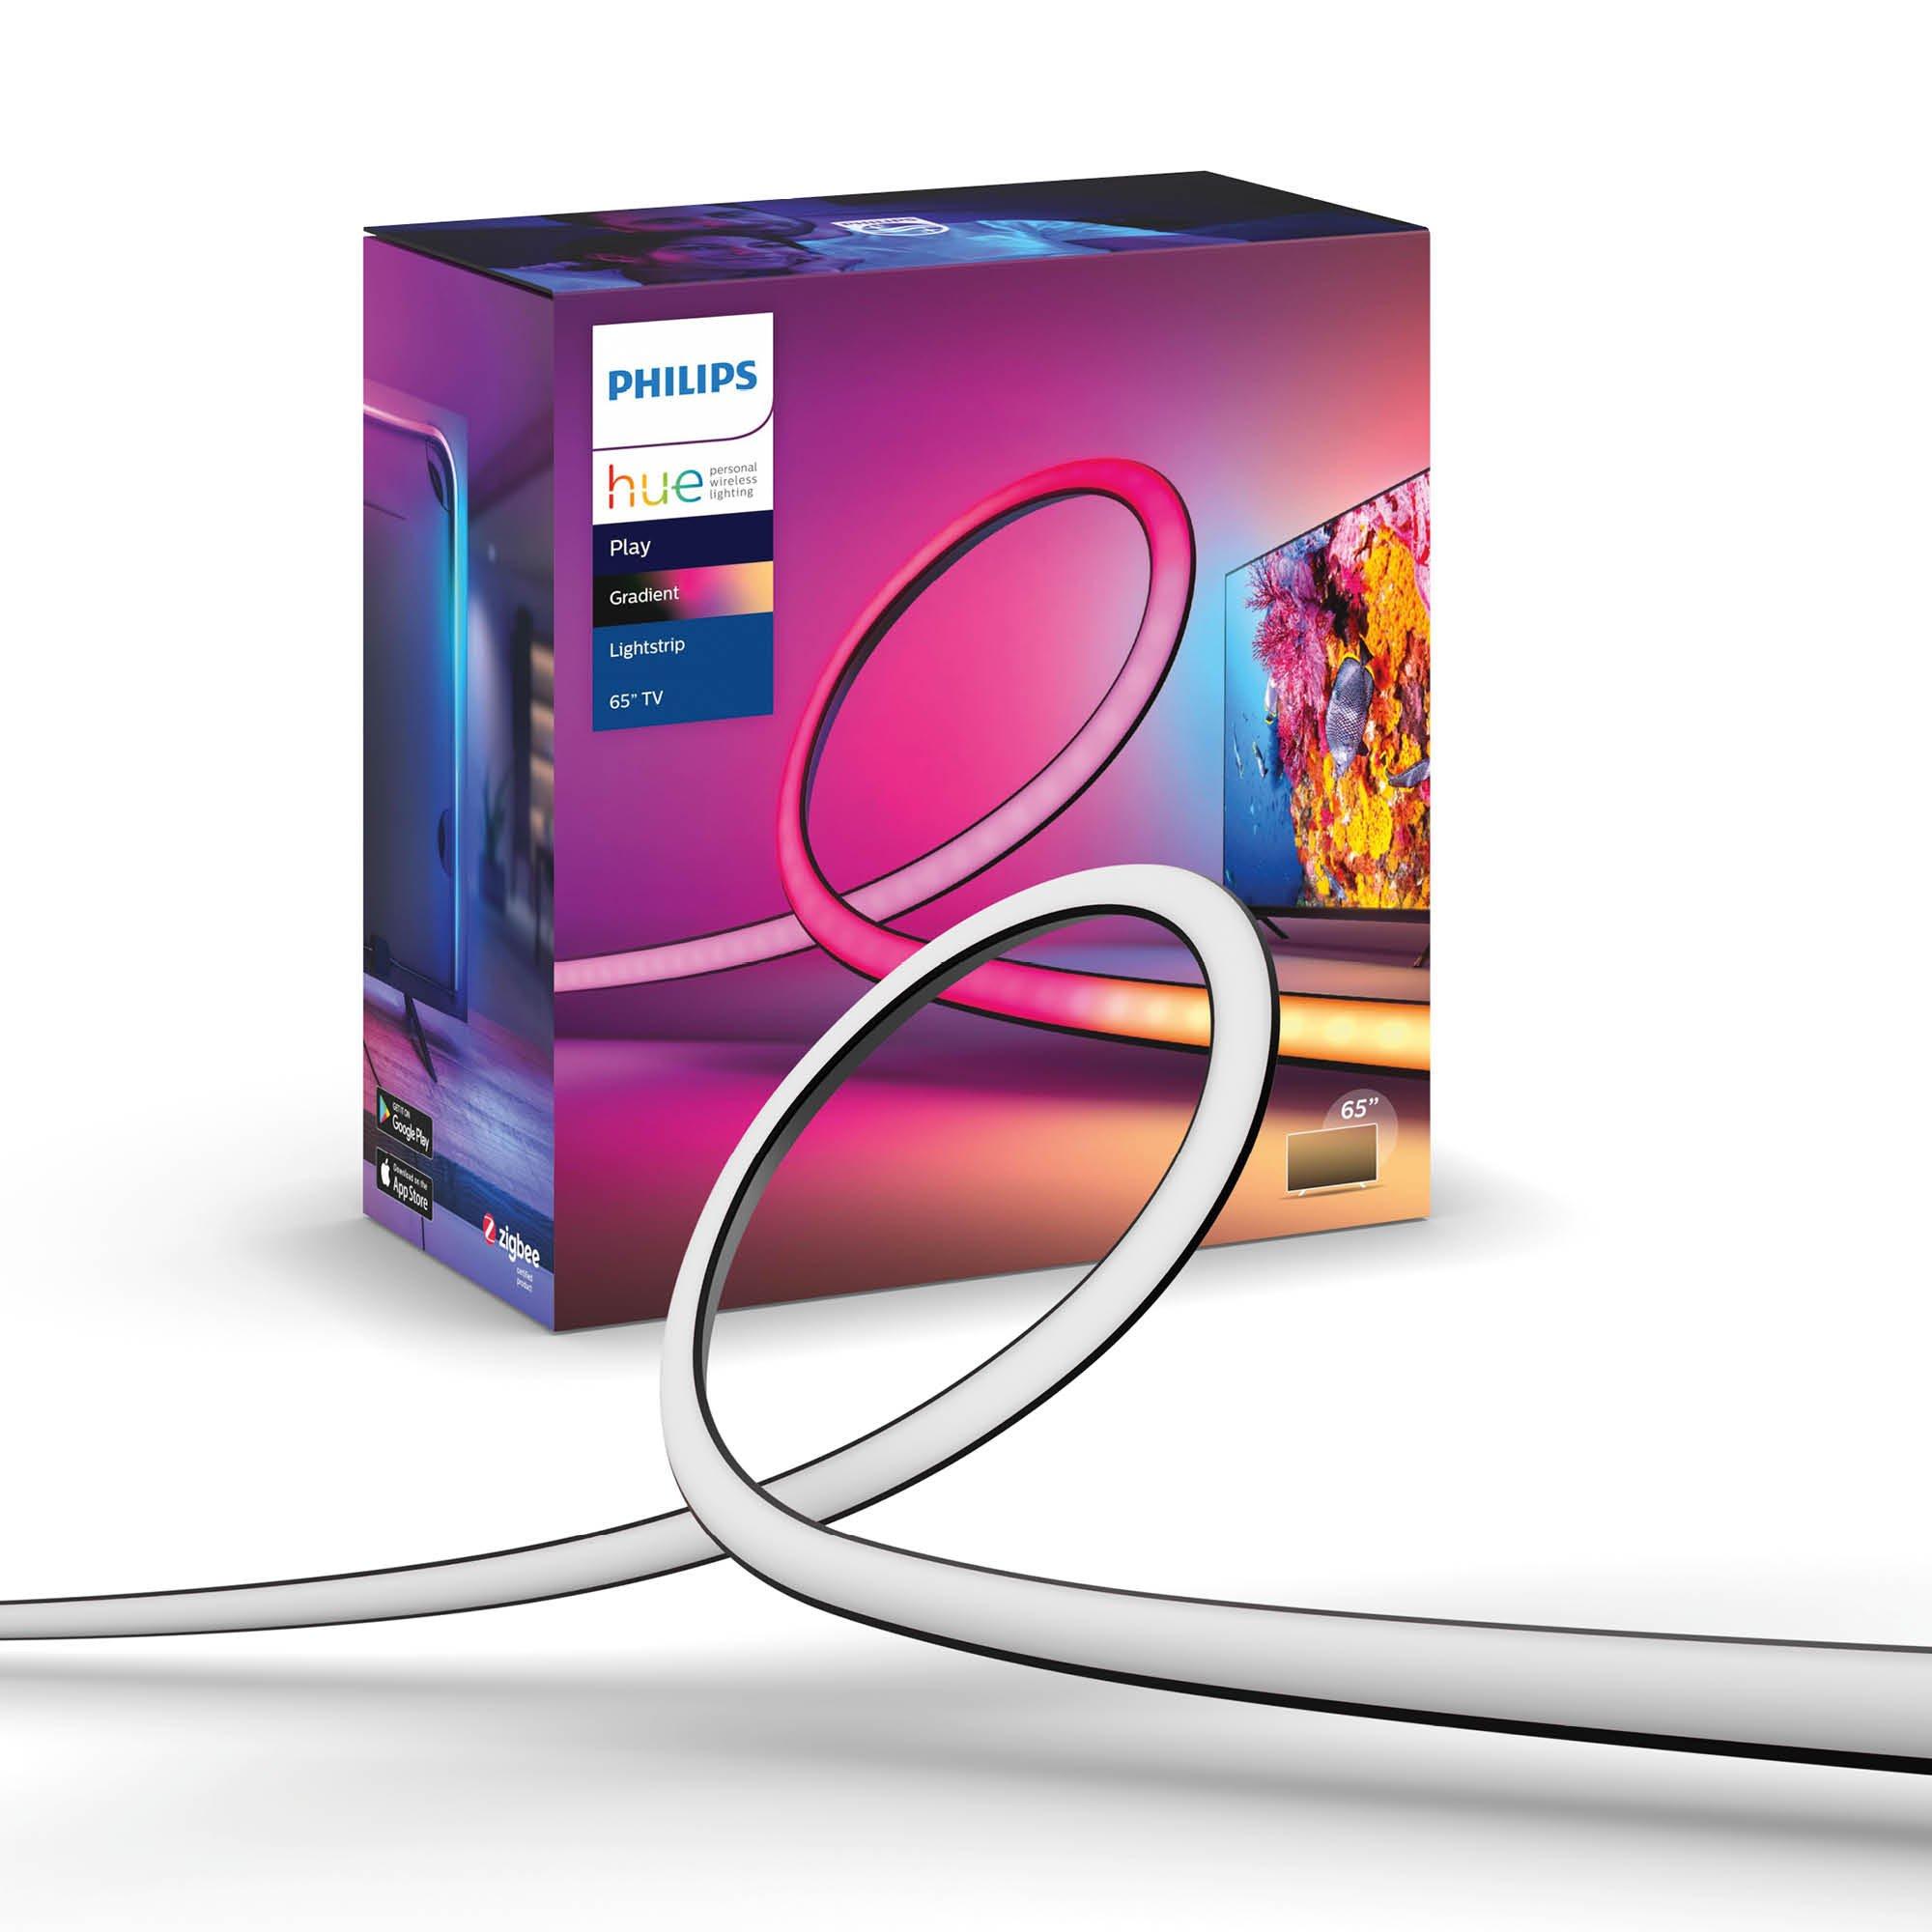 "Philips Hue - Lightstrip Gradient Lightstrip (for TV) TV 65"" EU Requires Hue Sync Box"